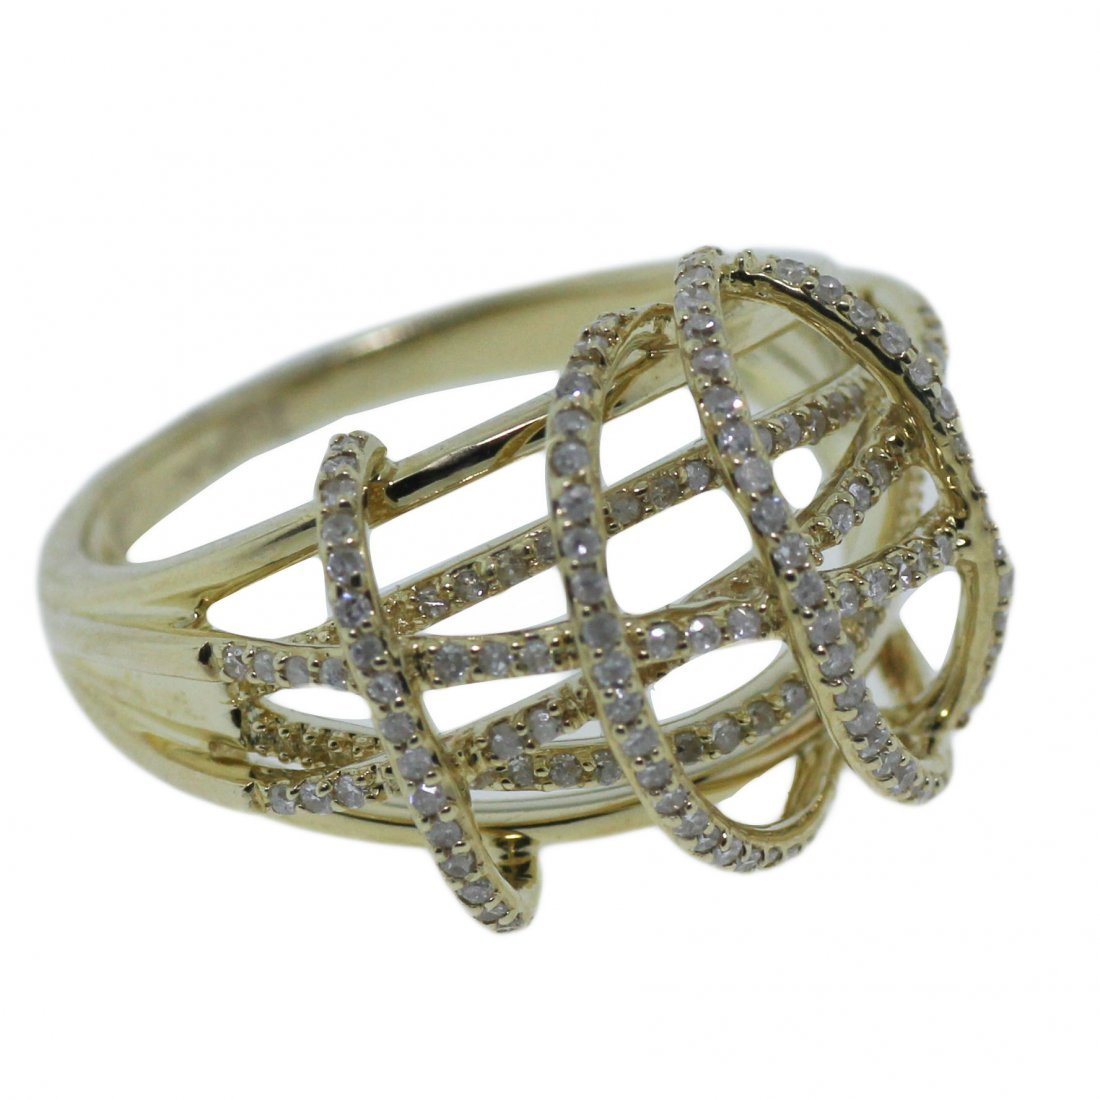 Micro Pave Diamond & 14K Yellow Gold Ring Watch Video!